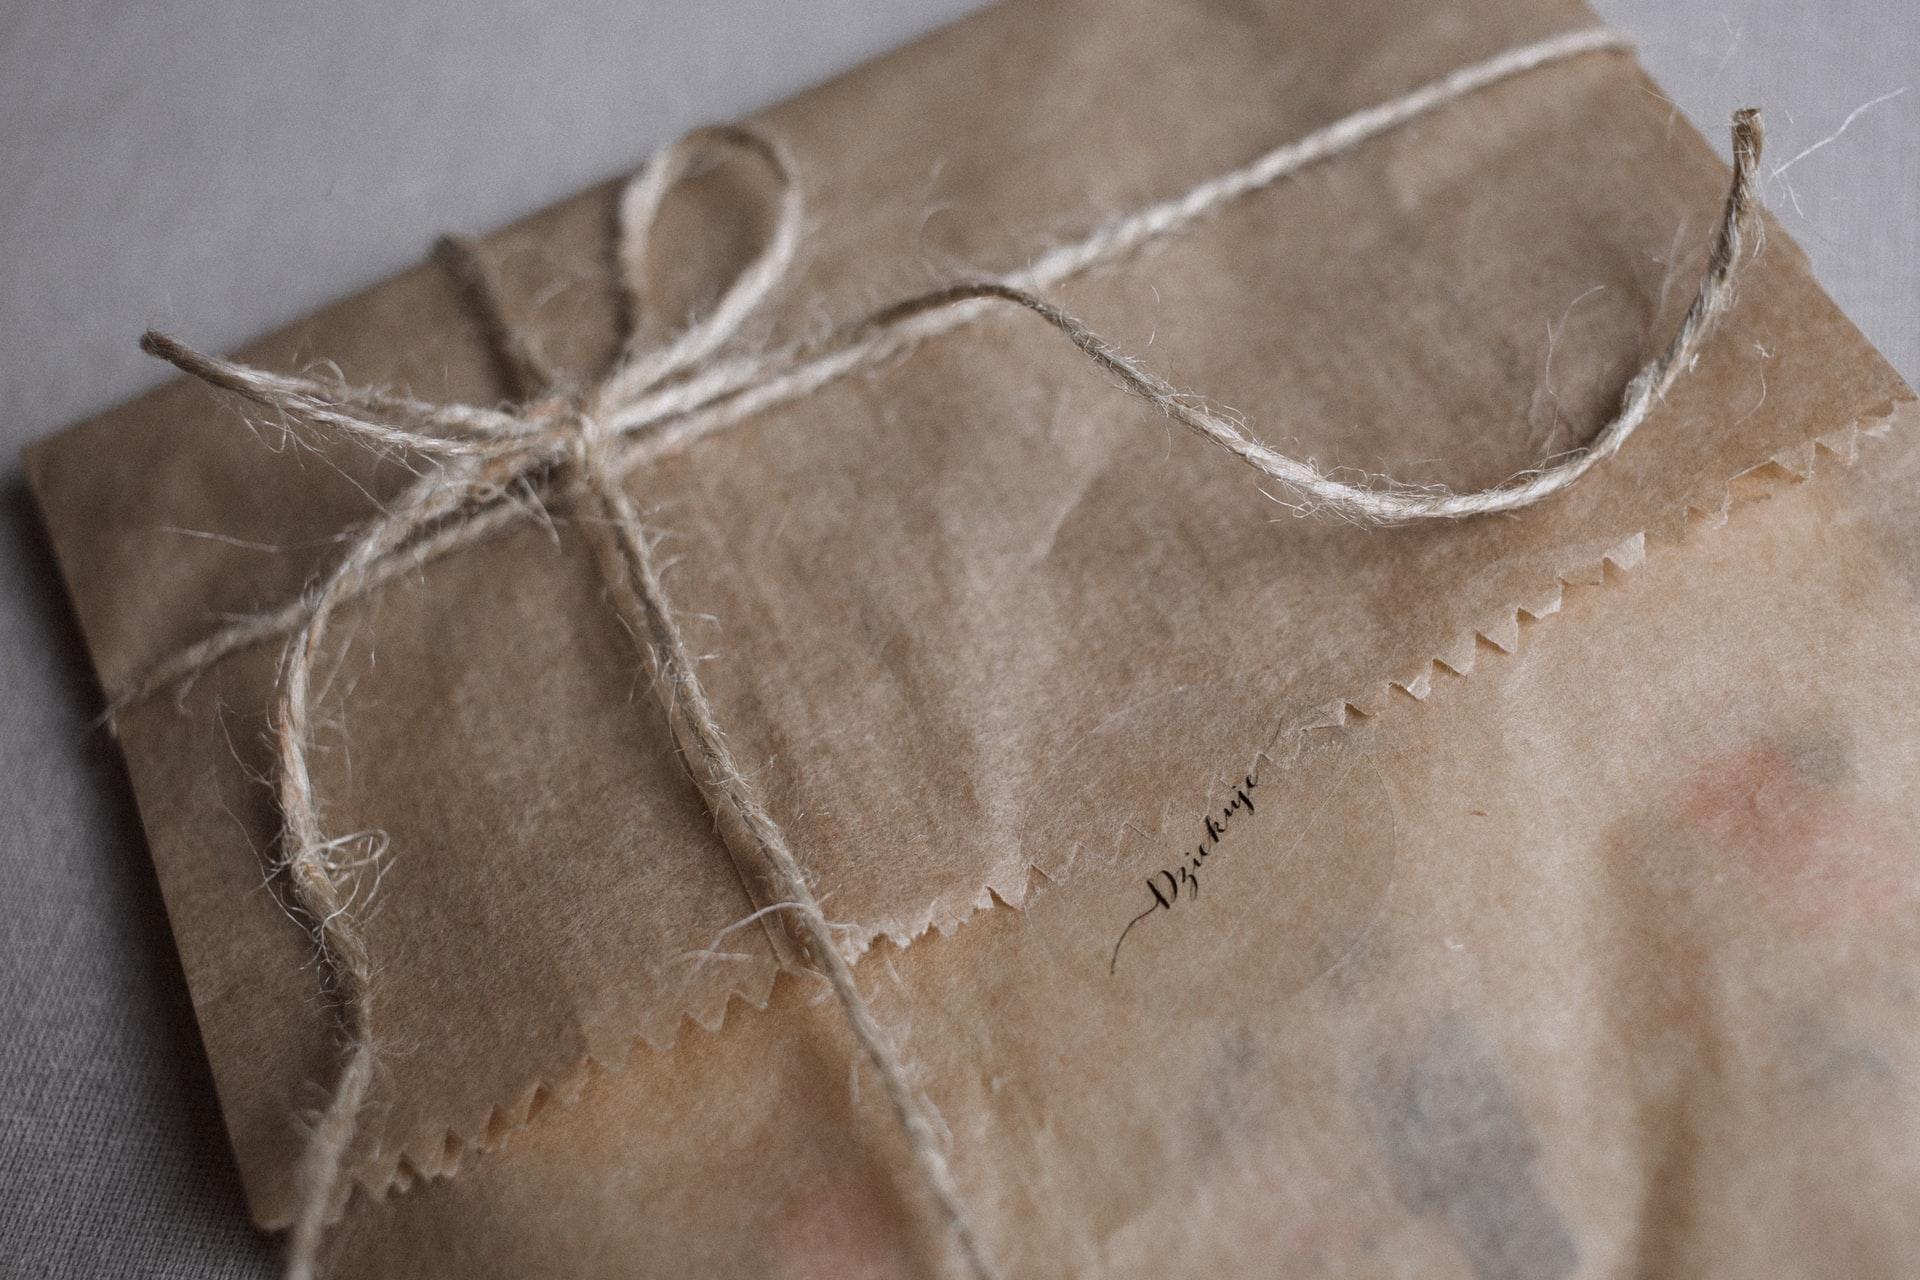 freestocks uqzIUz9NczE unsplash - Papirsposer til bageriet, slikbutikken og andre erhverv